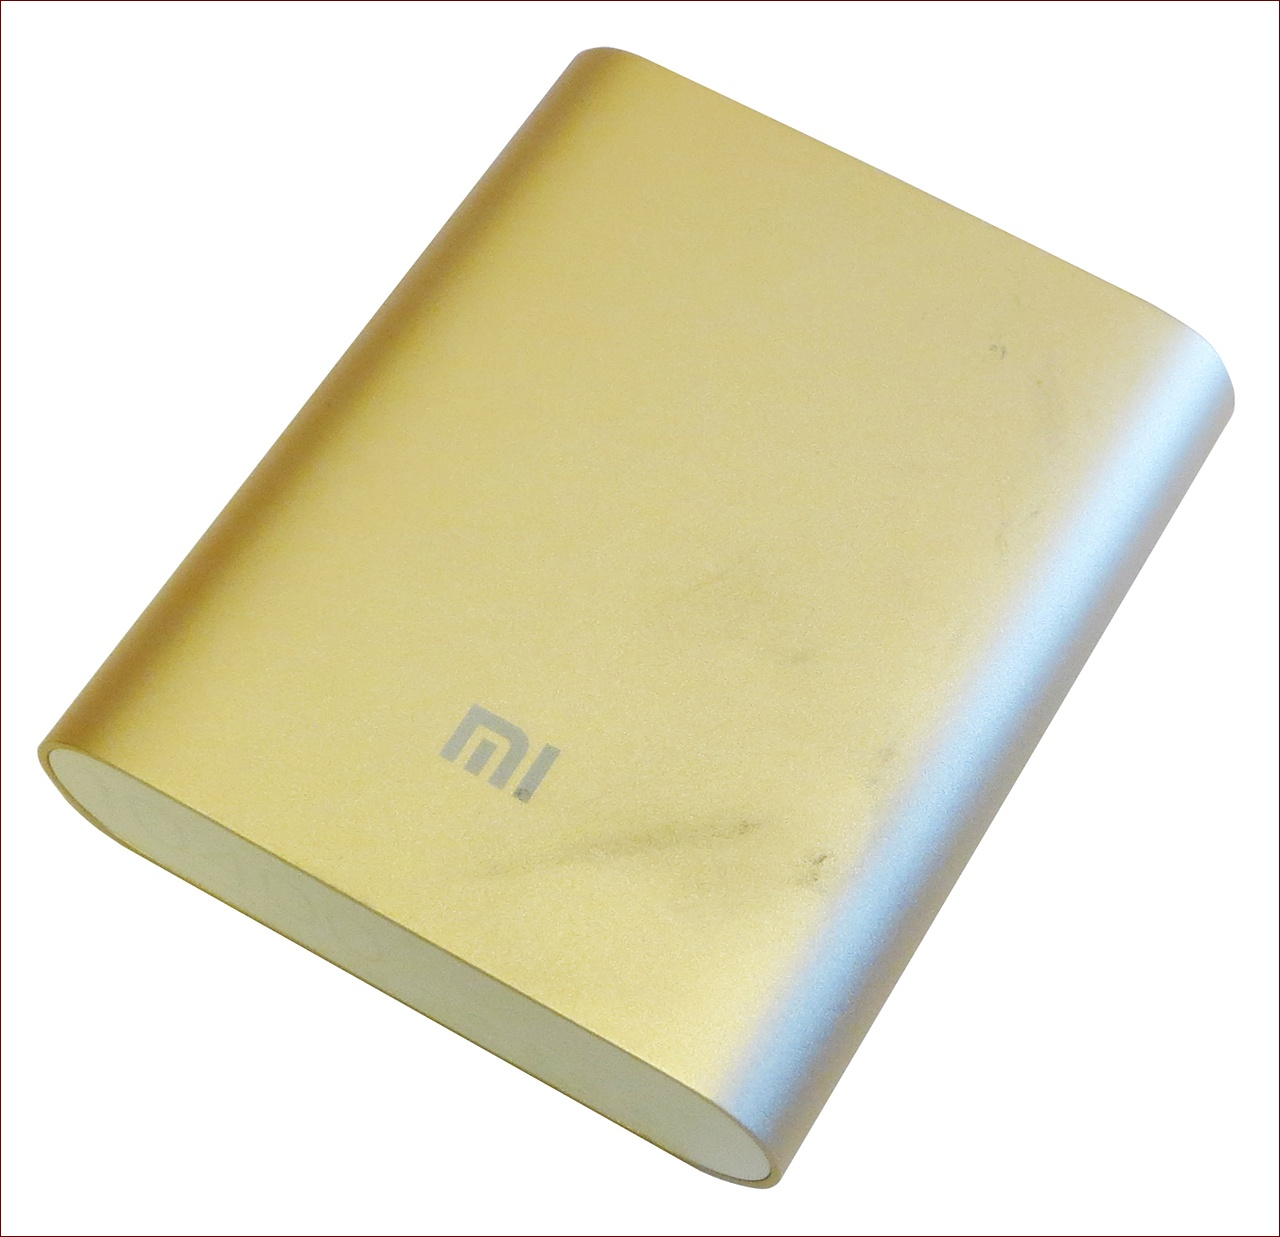 Внешние аккумуляторы HIPER и Xiaomi Mi — взгляд дилетанта - 21